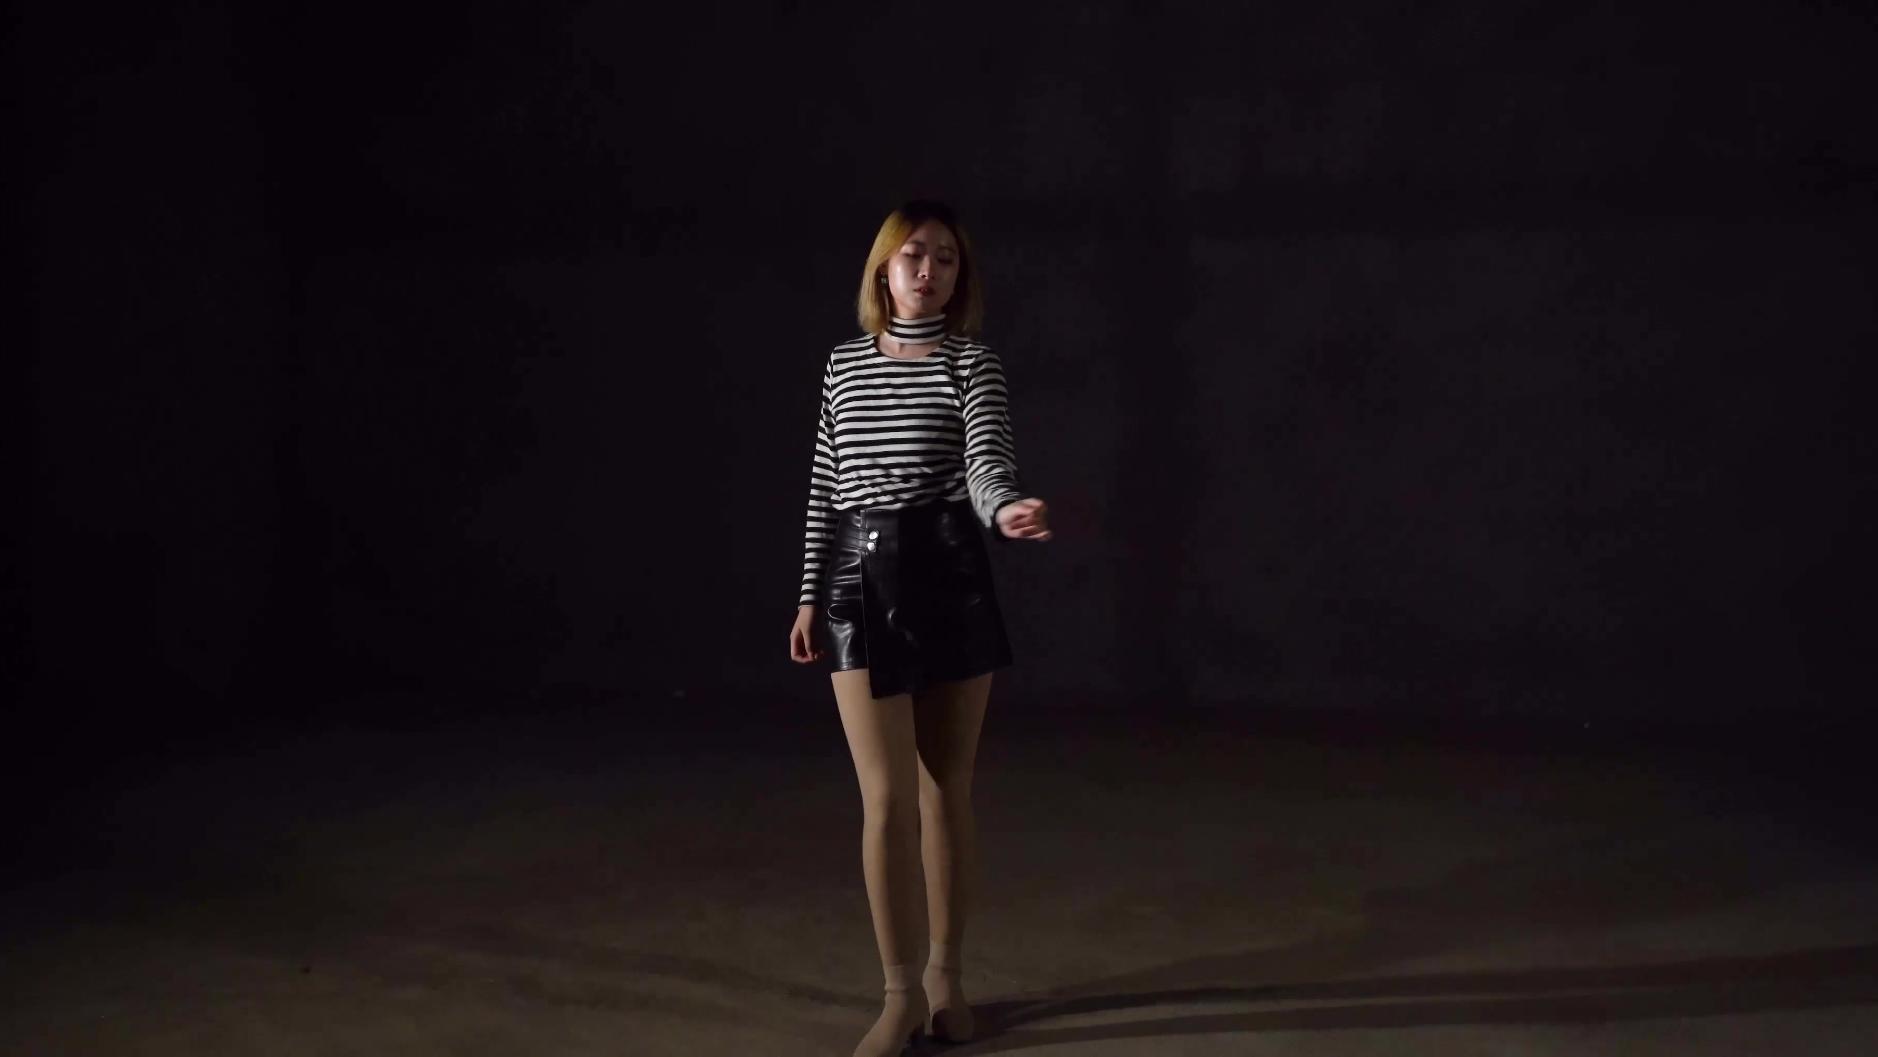 【A等生】【次元】nice body-孝敏 dance cover